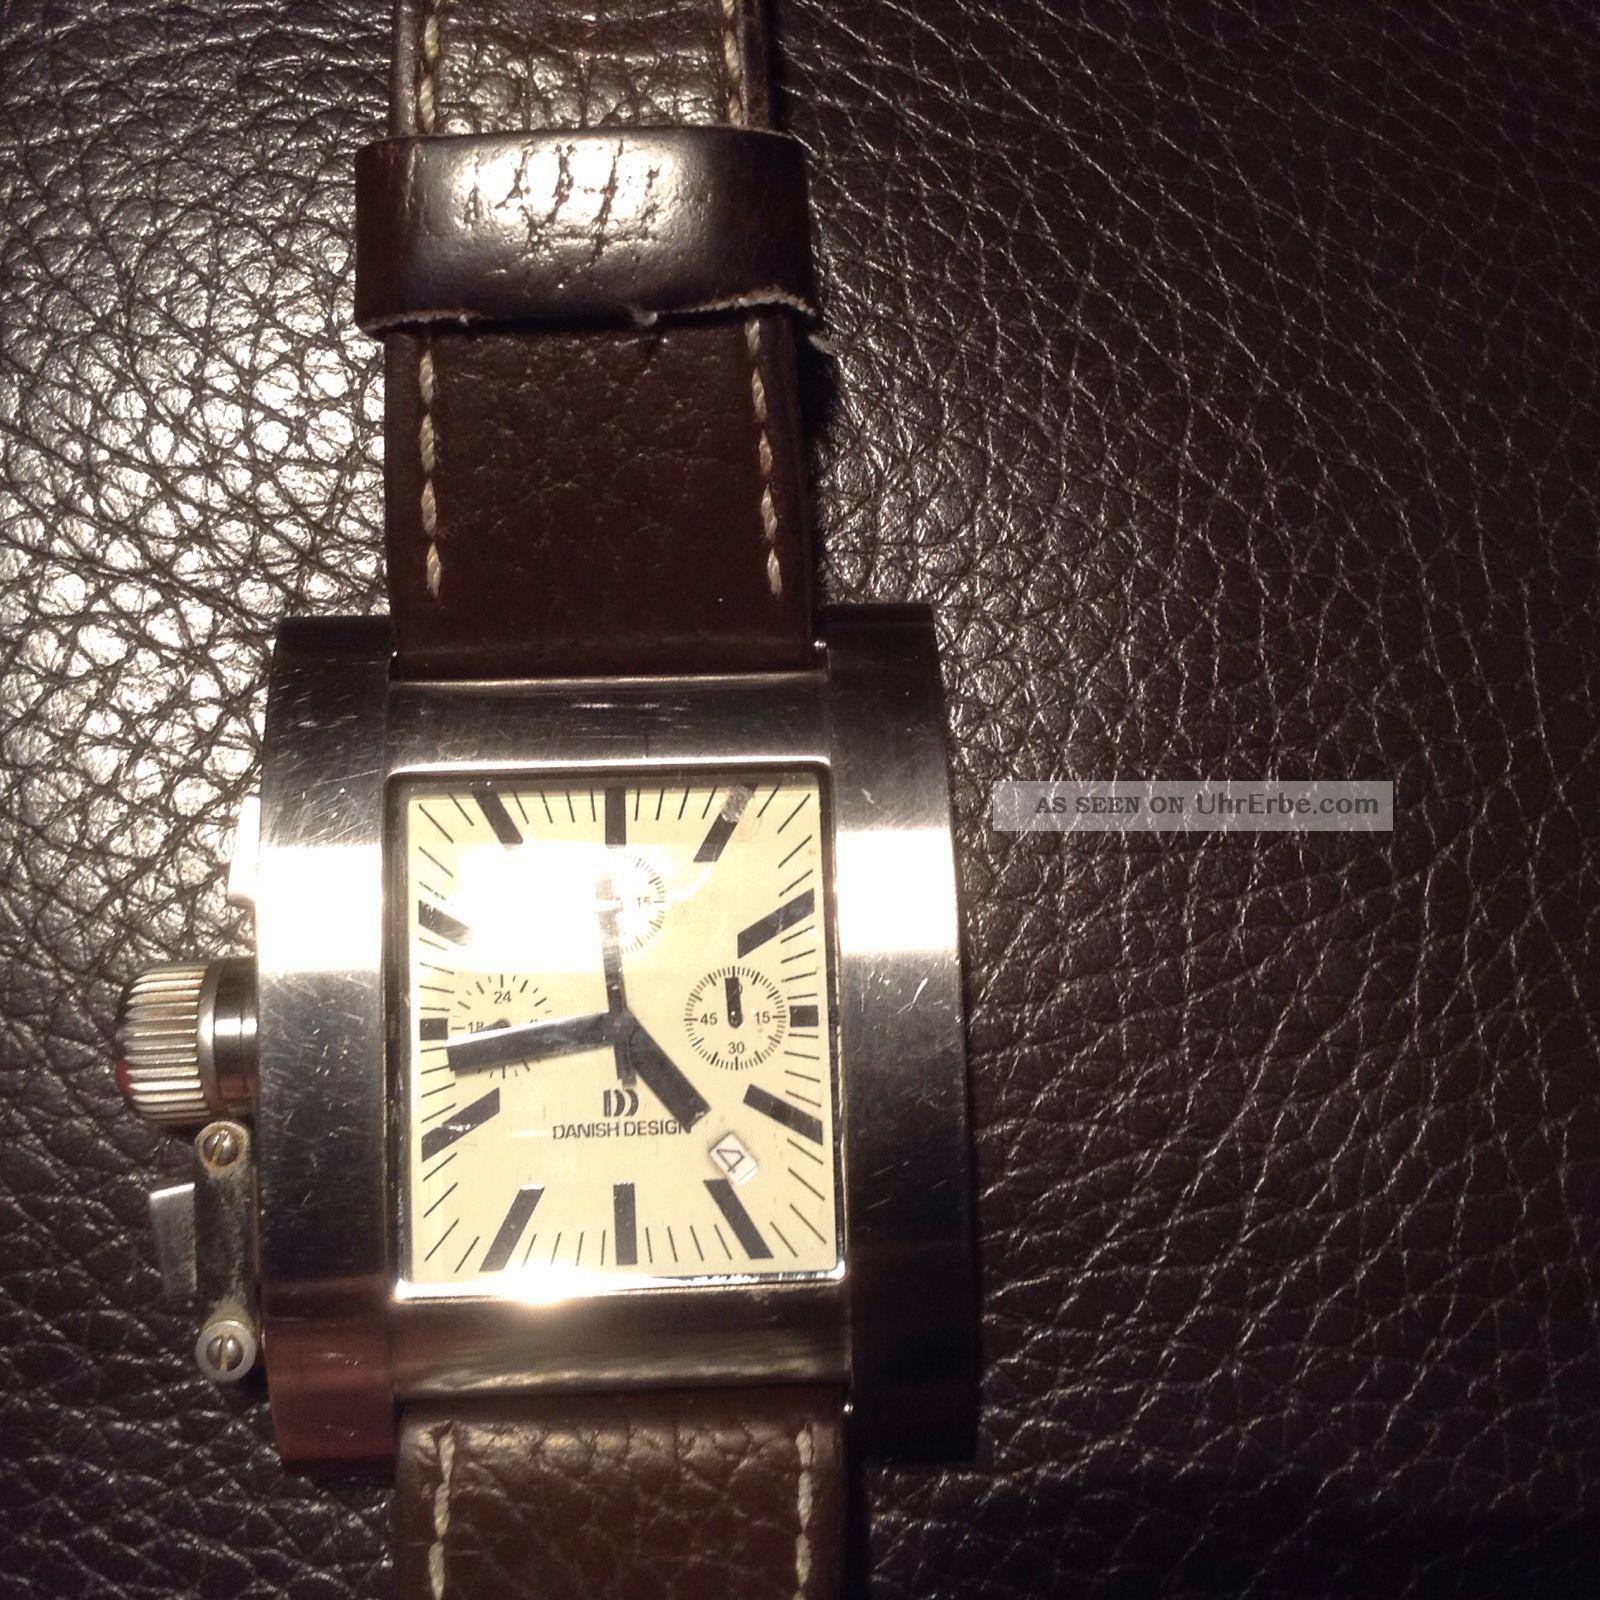 Danish Design Uhr Herren Braun Lederarmband Armbanduhren Bild